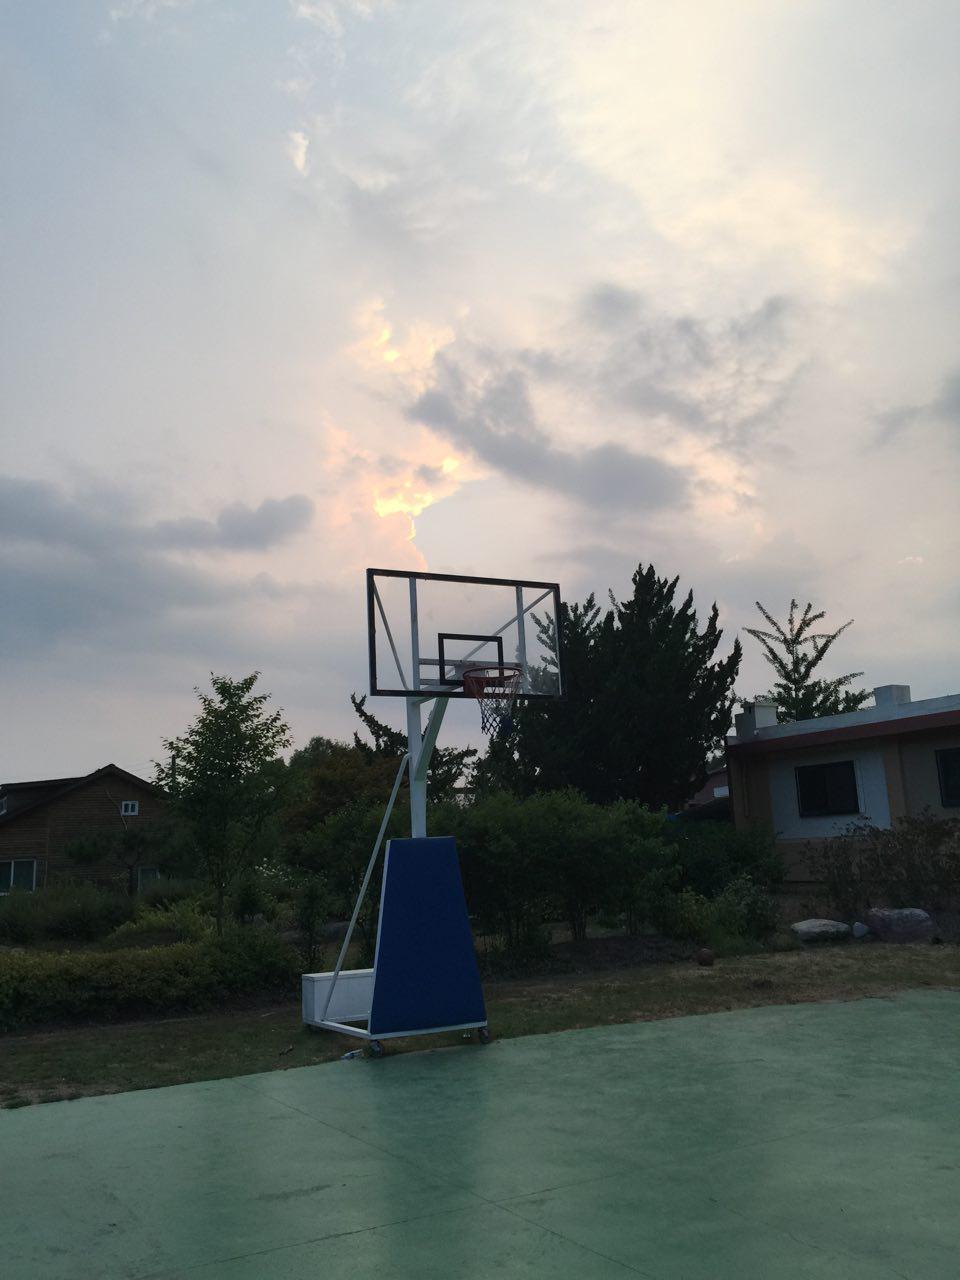 photo_2018-07-31_08-42-16 (2).jpg